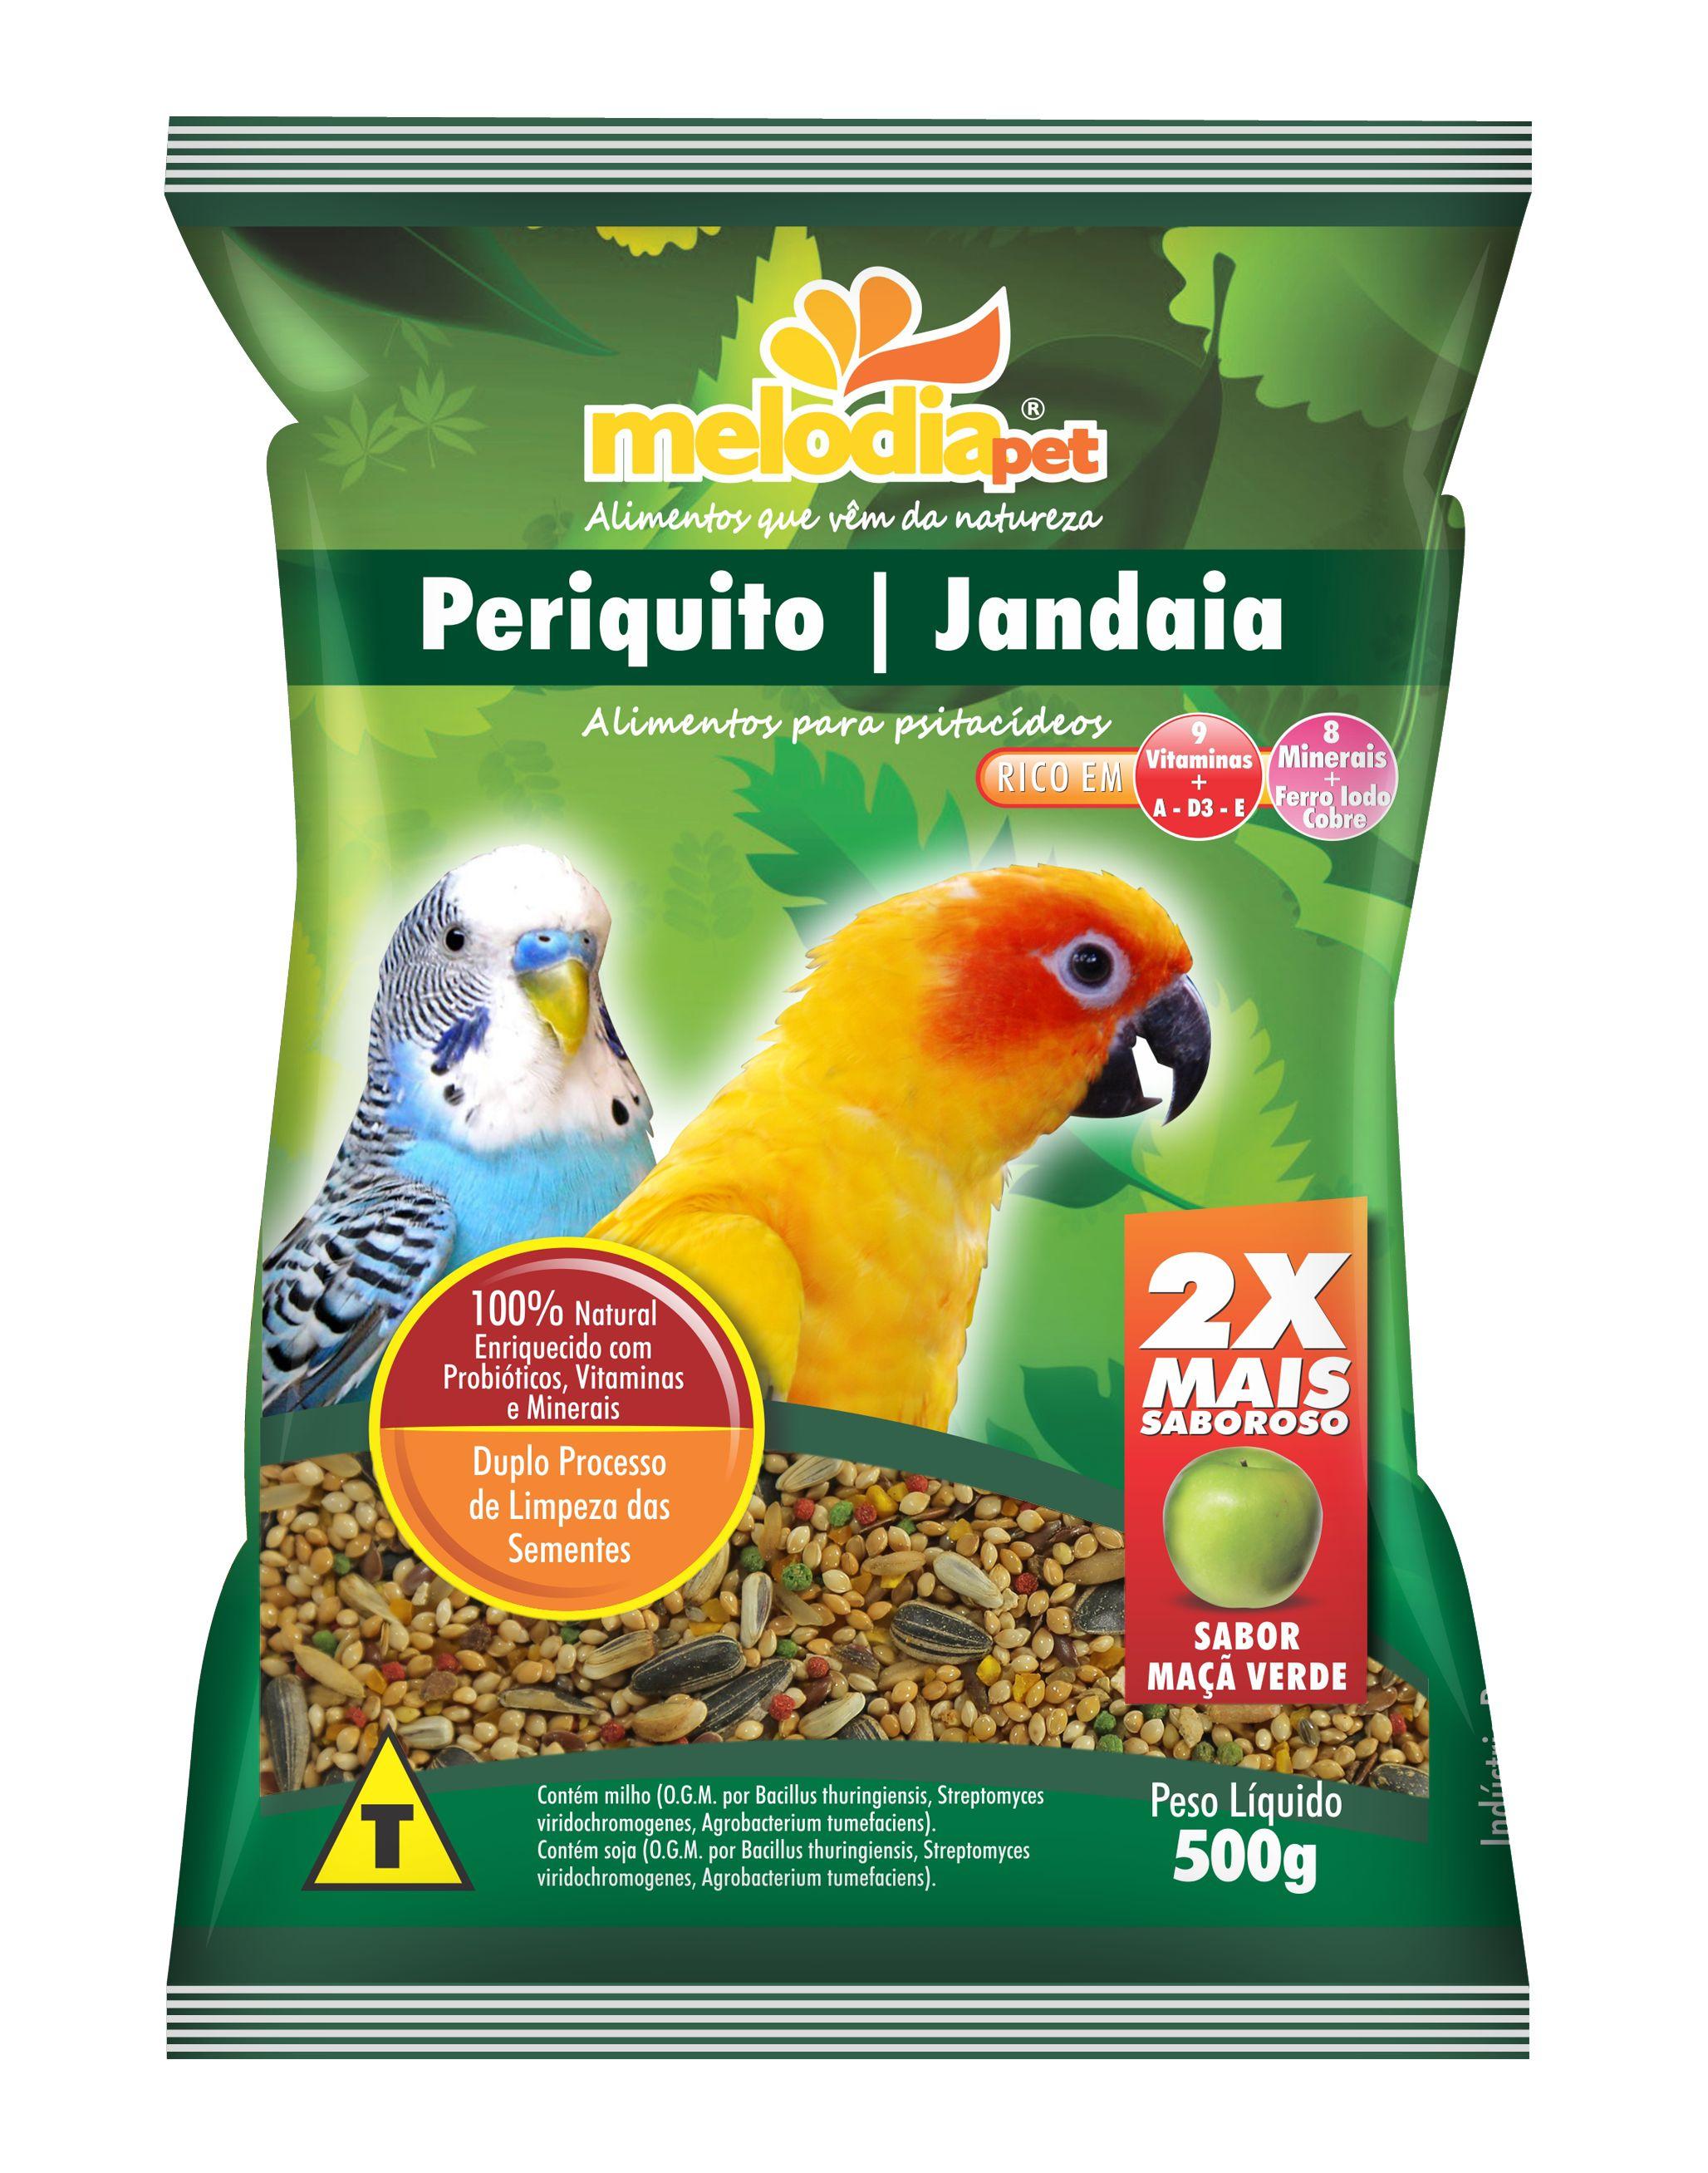 ALIMENTO P/PERIQUITO/JANDAIA...500g